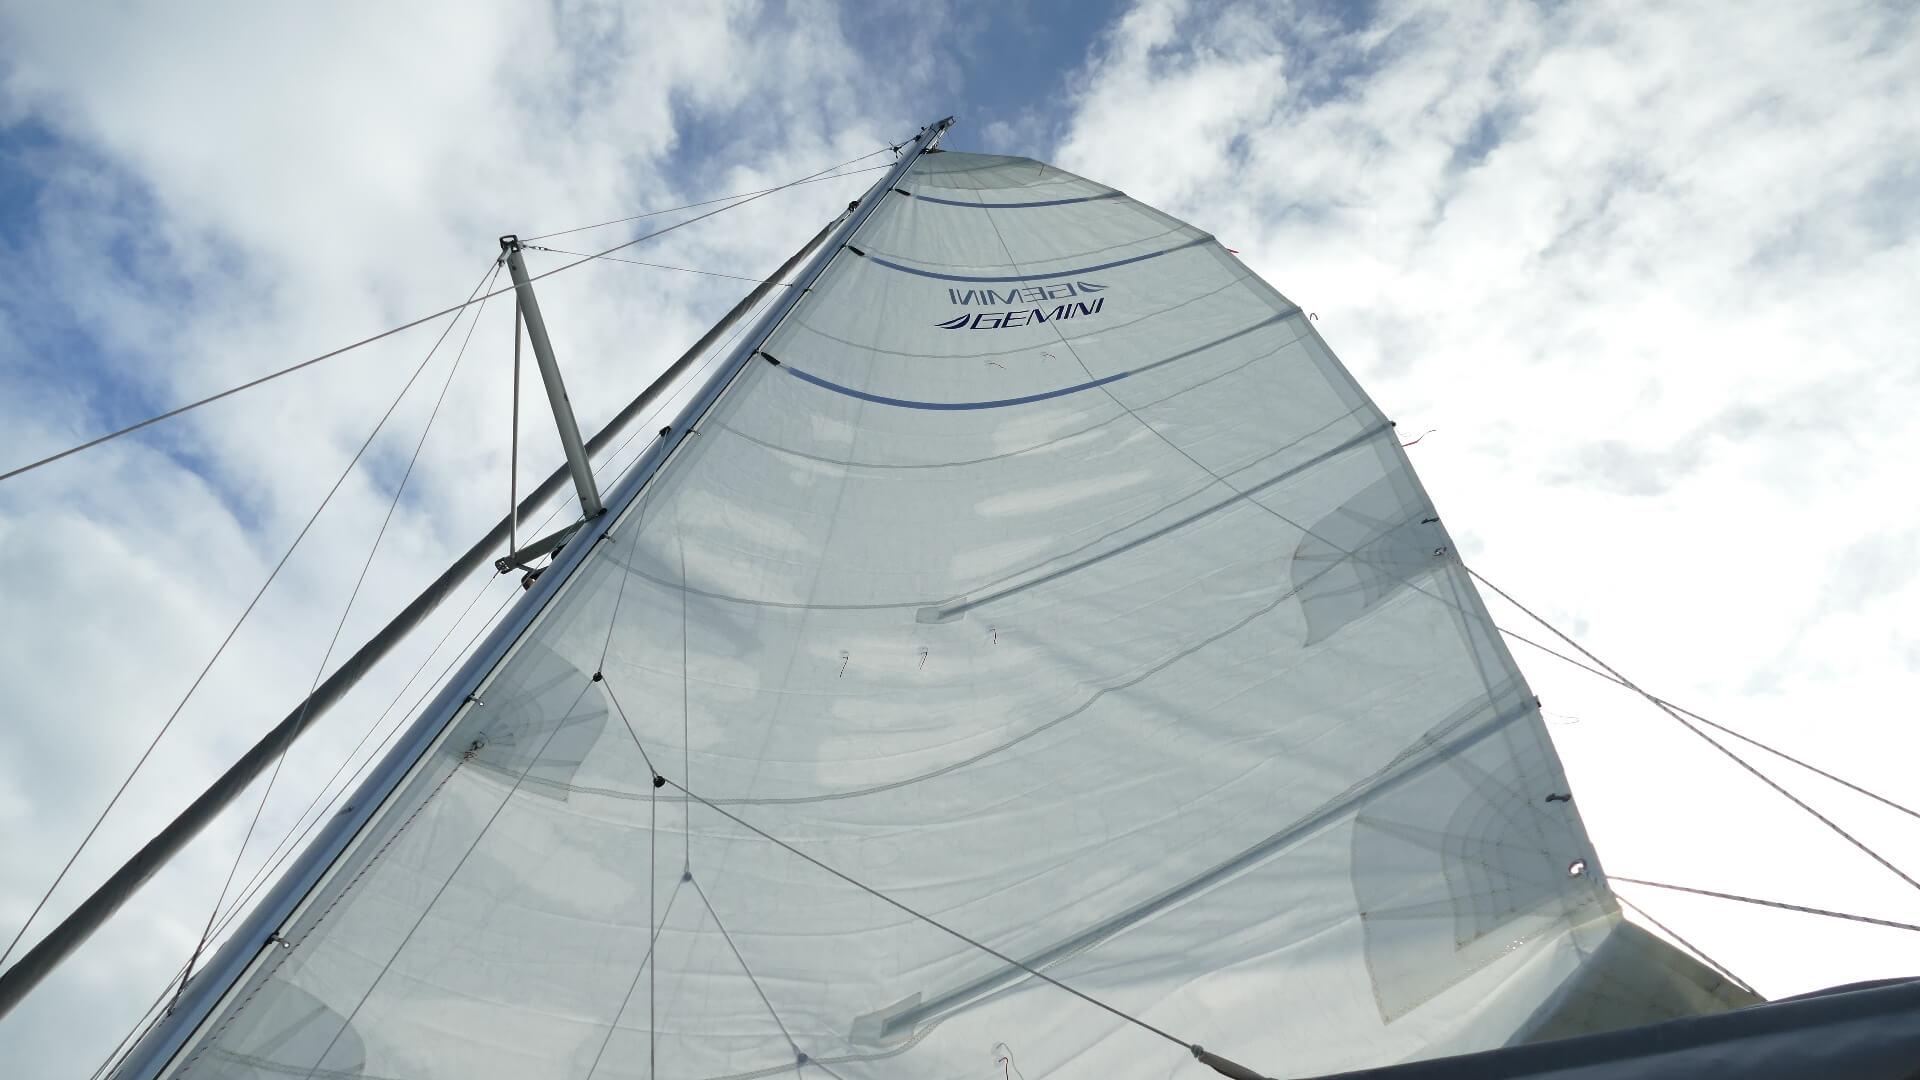 Used Sail Catamaran for Sale 2013 Legacy 35 Sails & Rigging